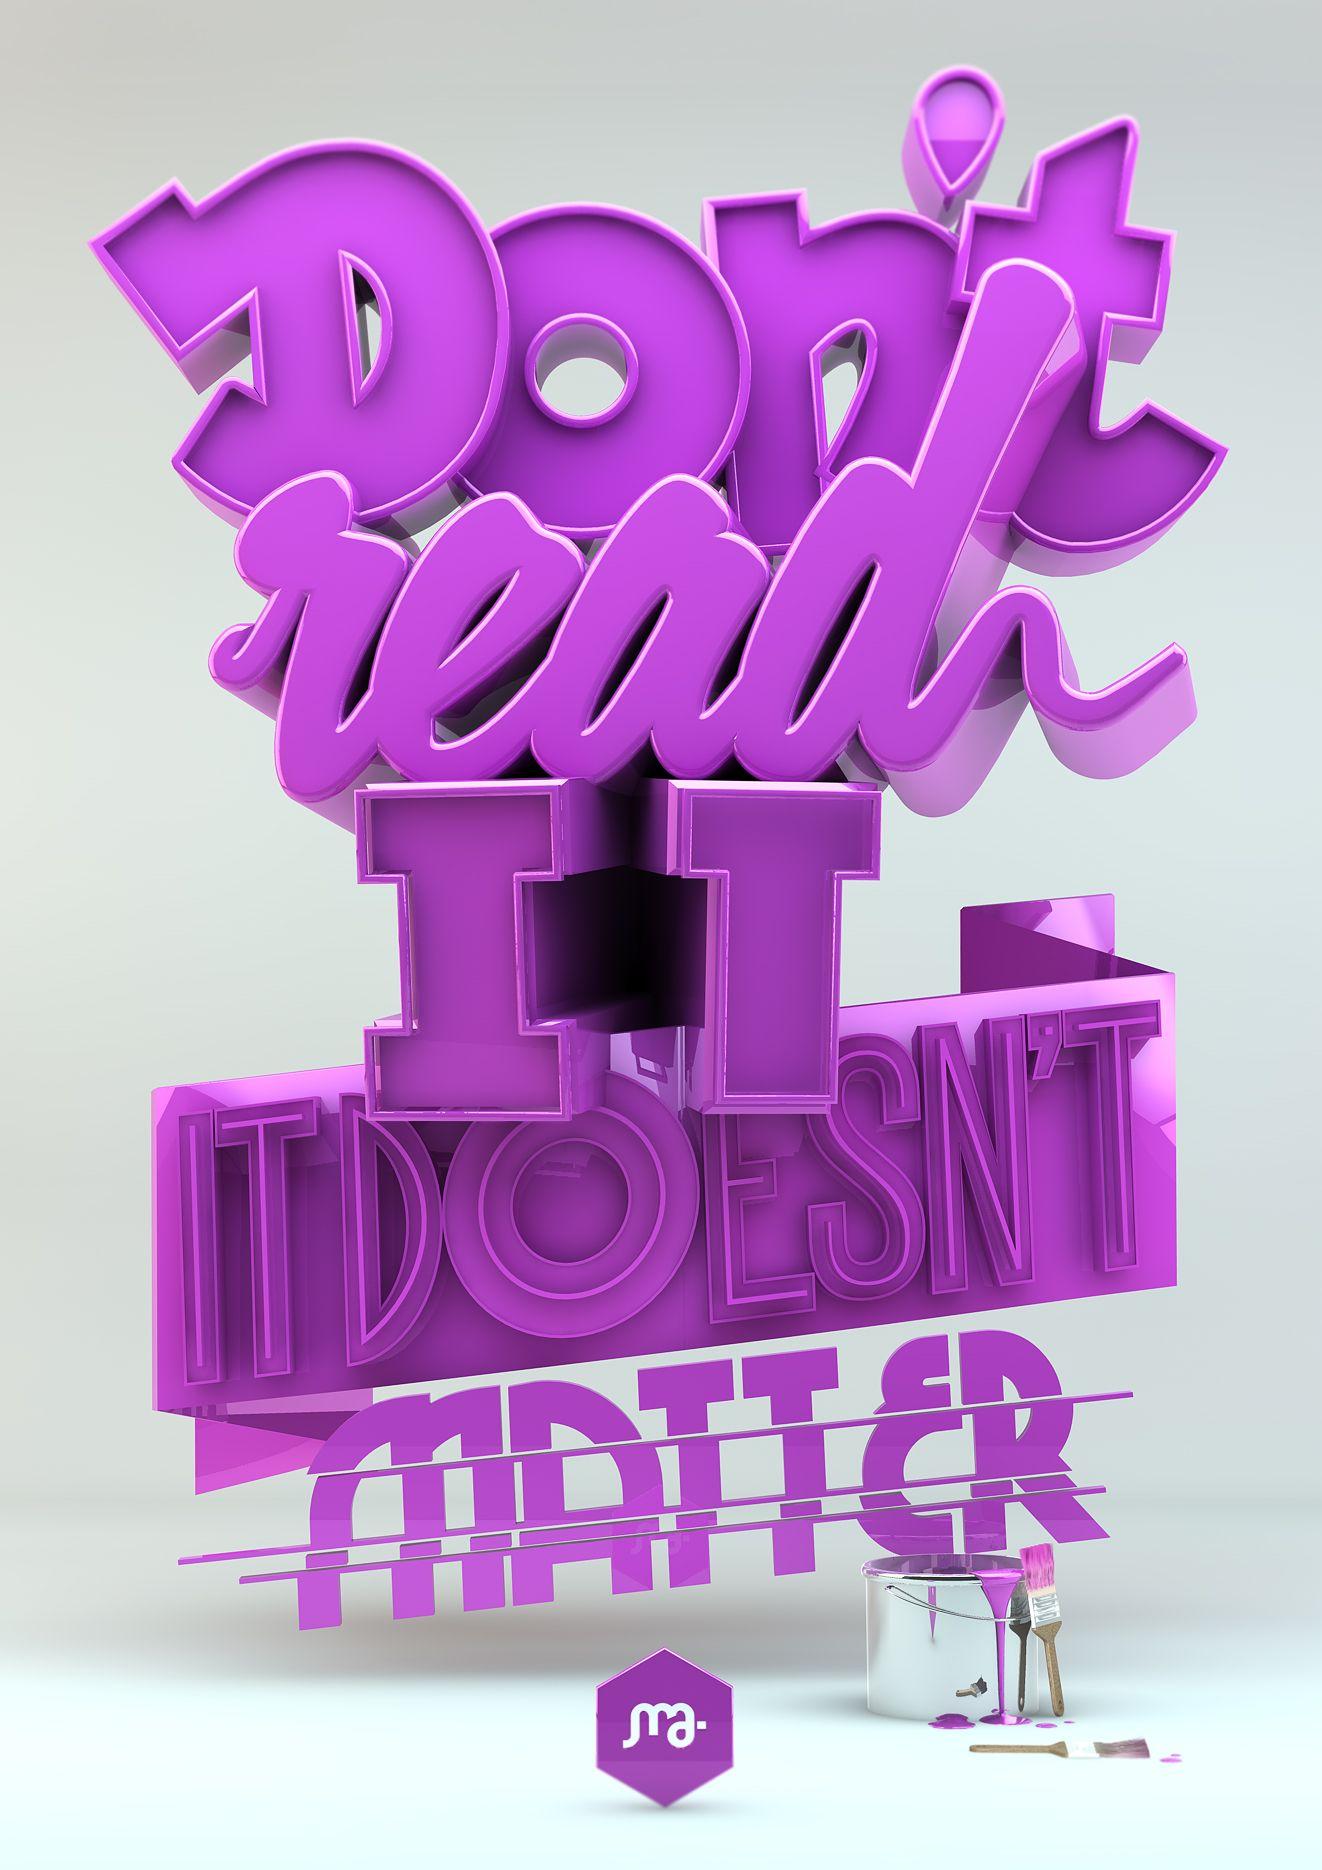 Don't read it, it doesn't matter / The Illustrati Community